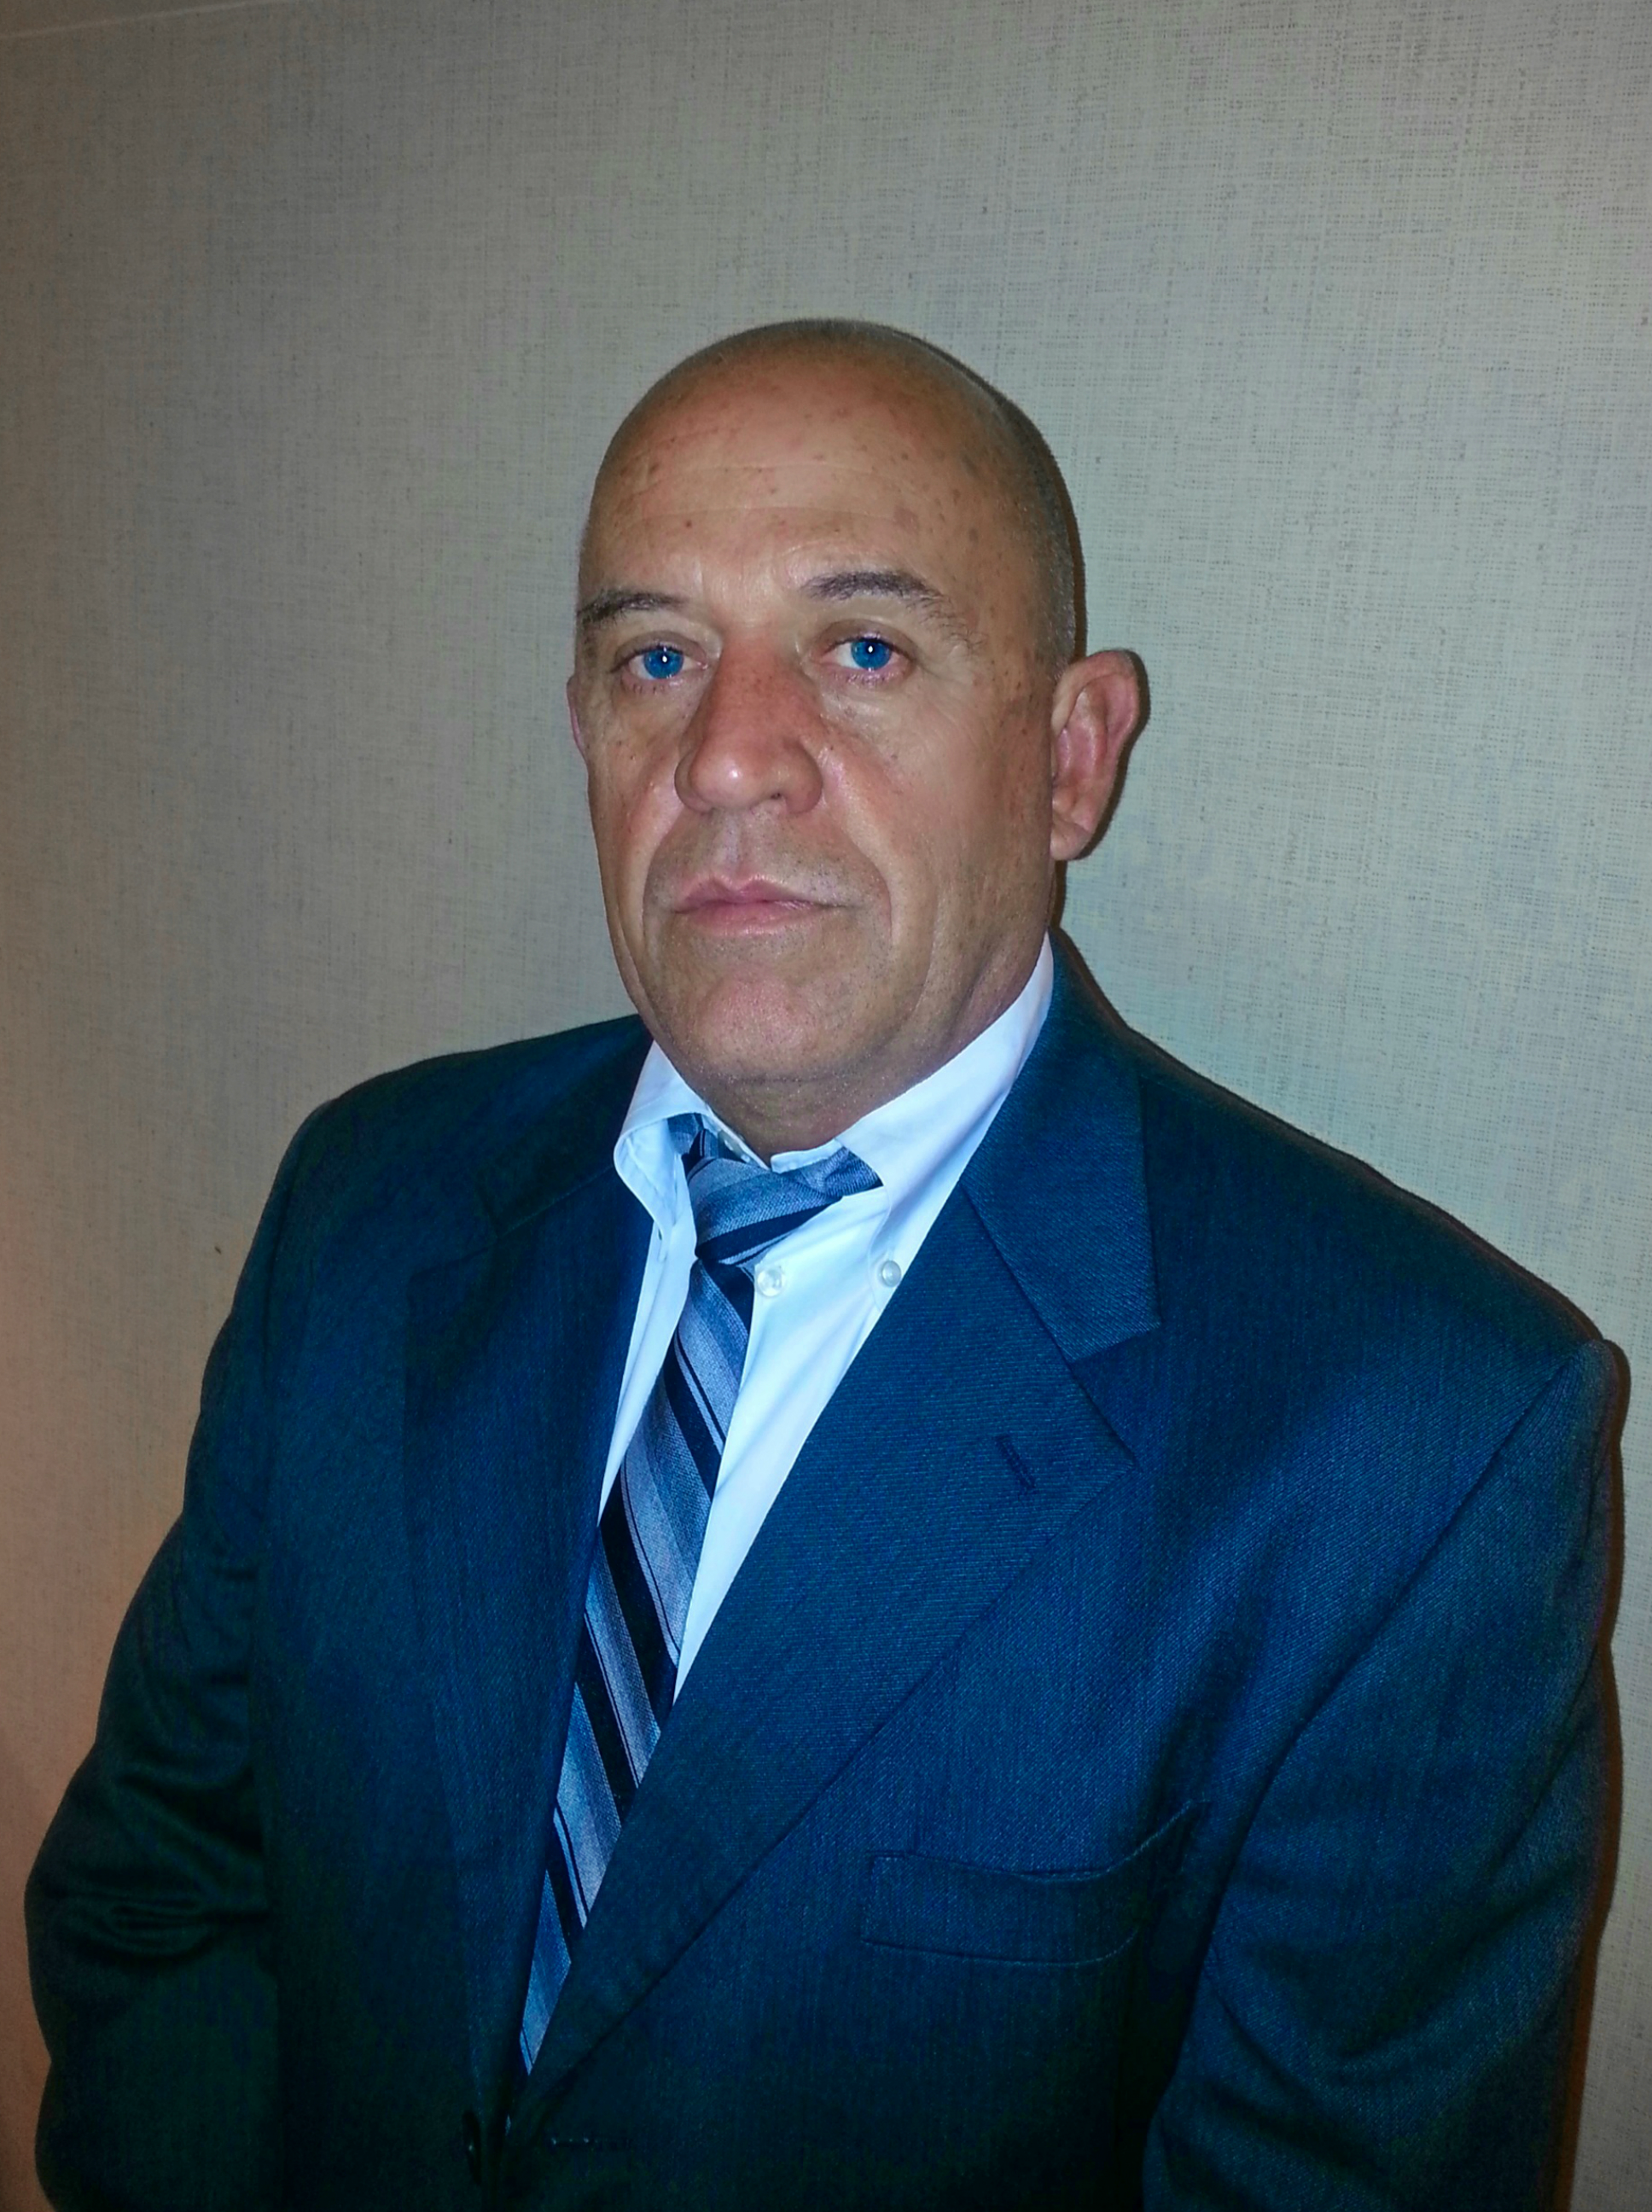 Darrell Mixon    Senior Associate, Quality Control & SMS  AvSec International   Federal Security Director   US Department of Homeland Security    Click Image for BIO